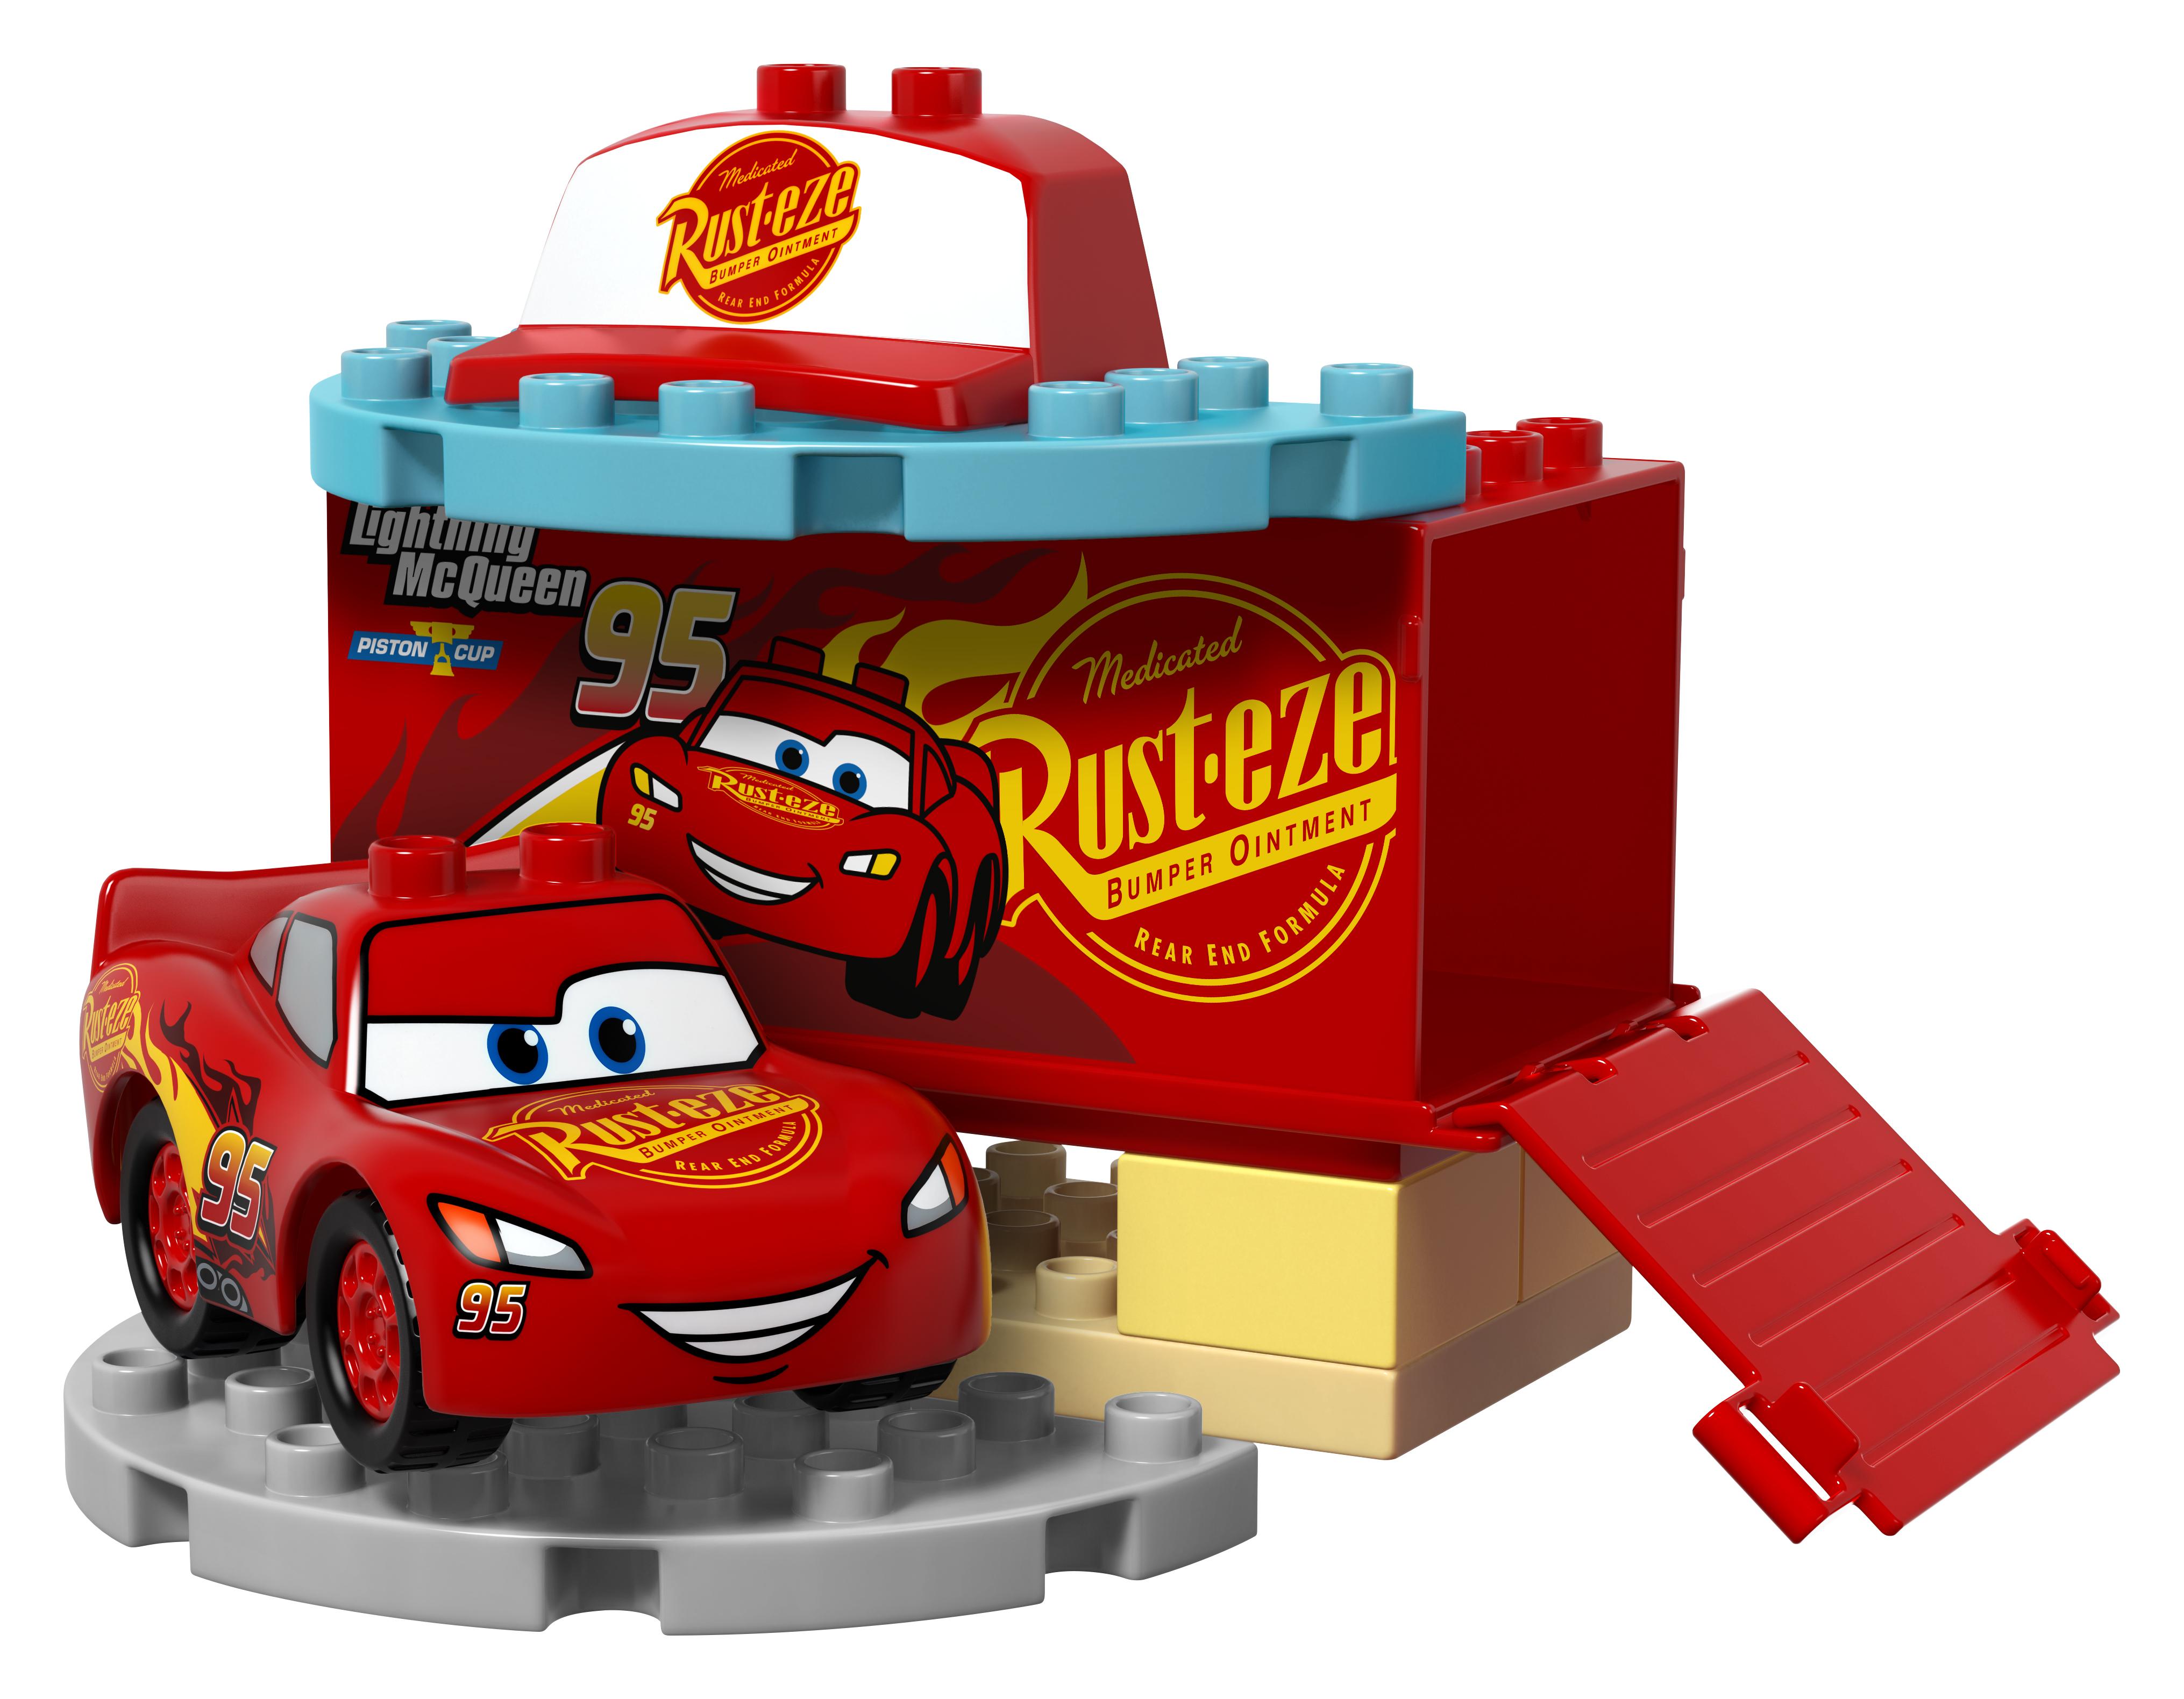 Lego Duplo Disney Cars 3 Alternative Mindz